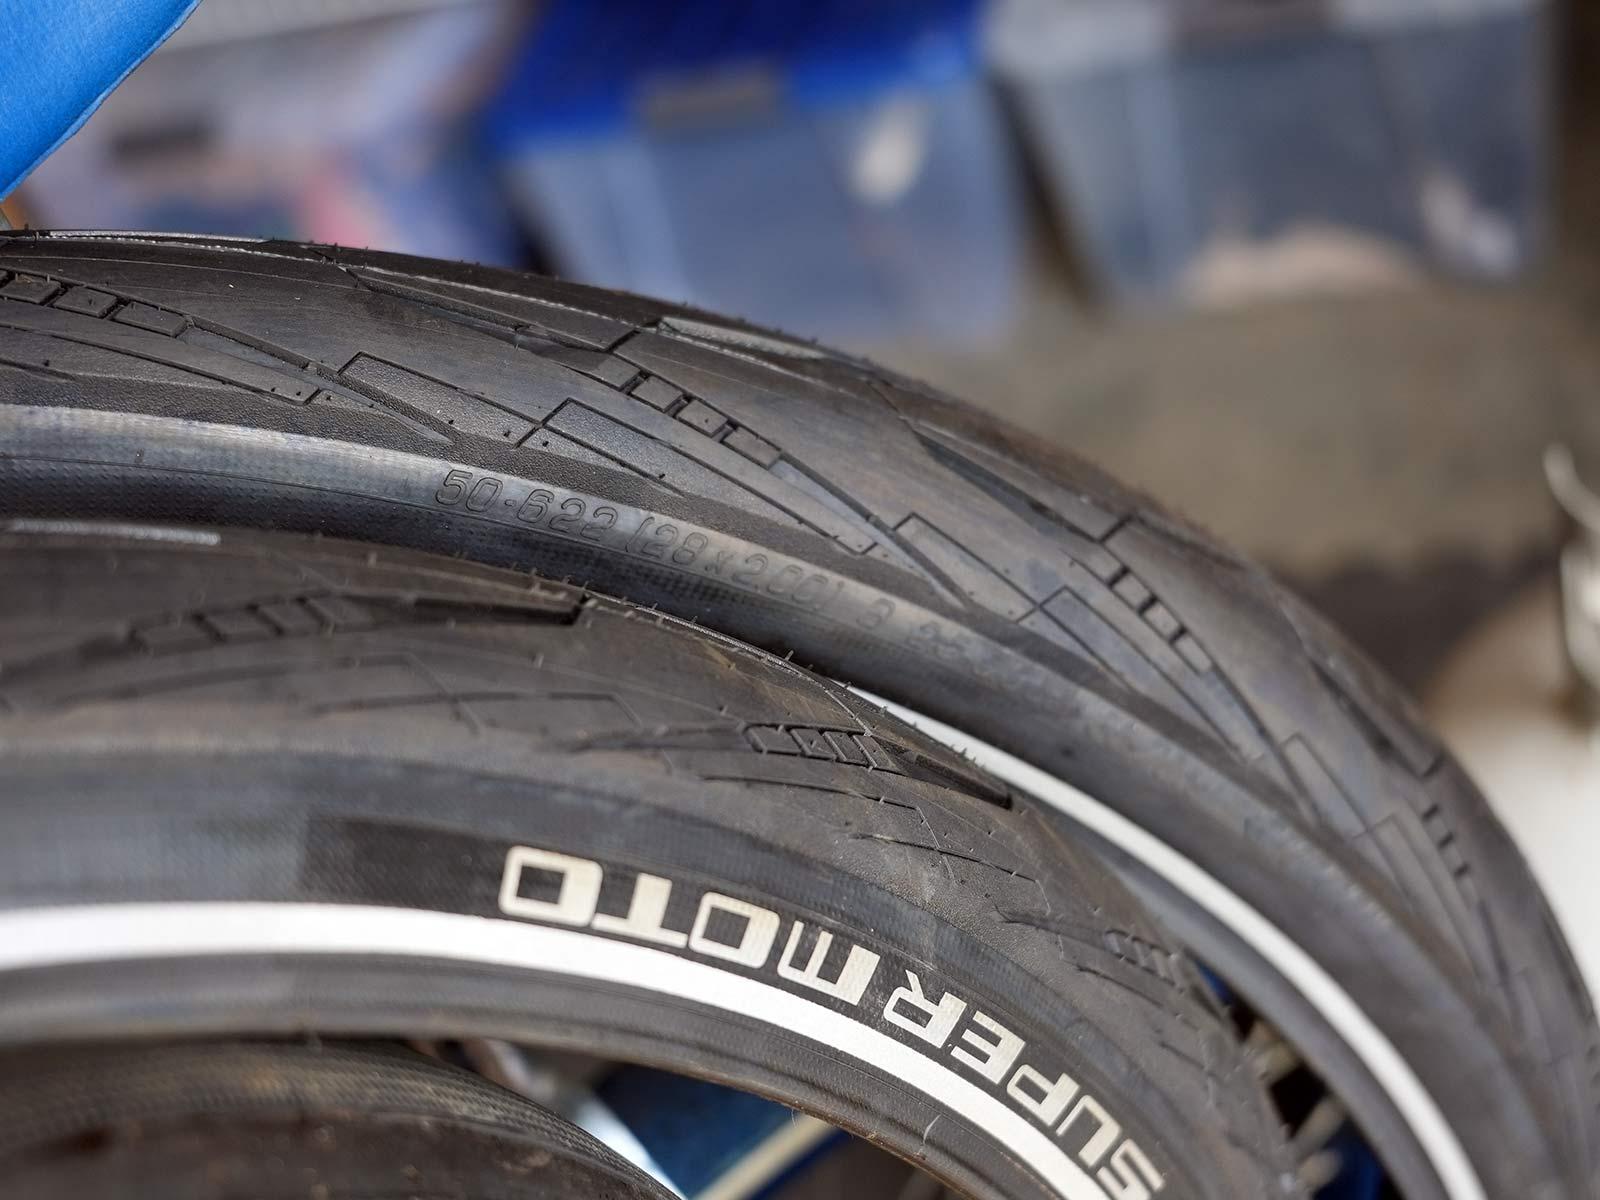 commuter e-bike tires closeup